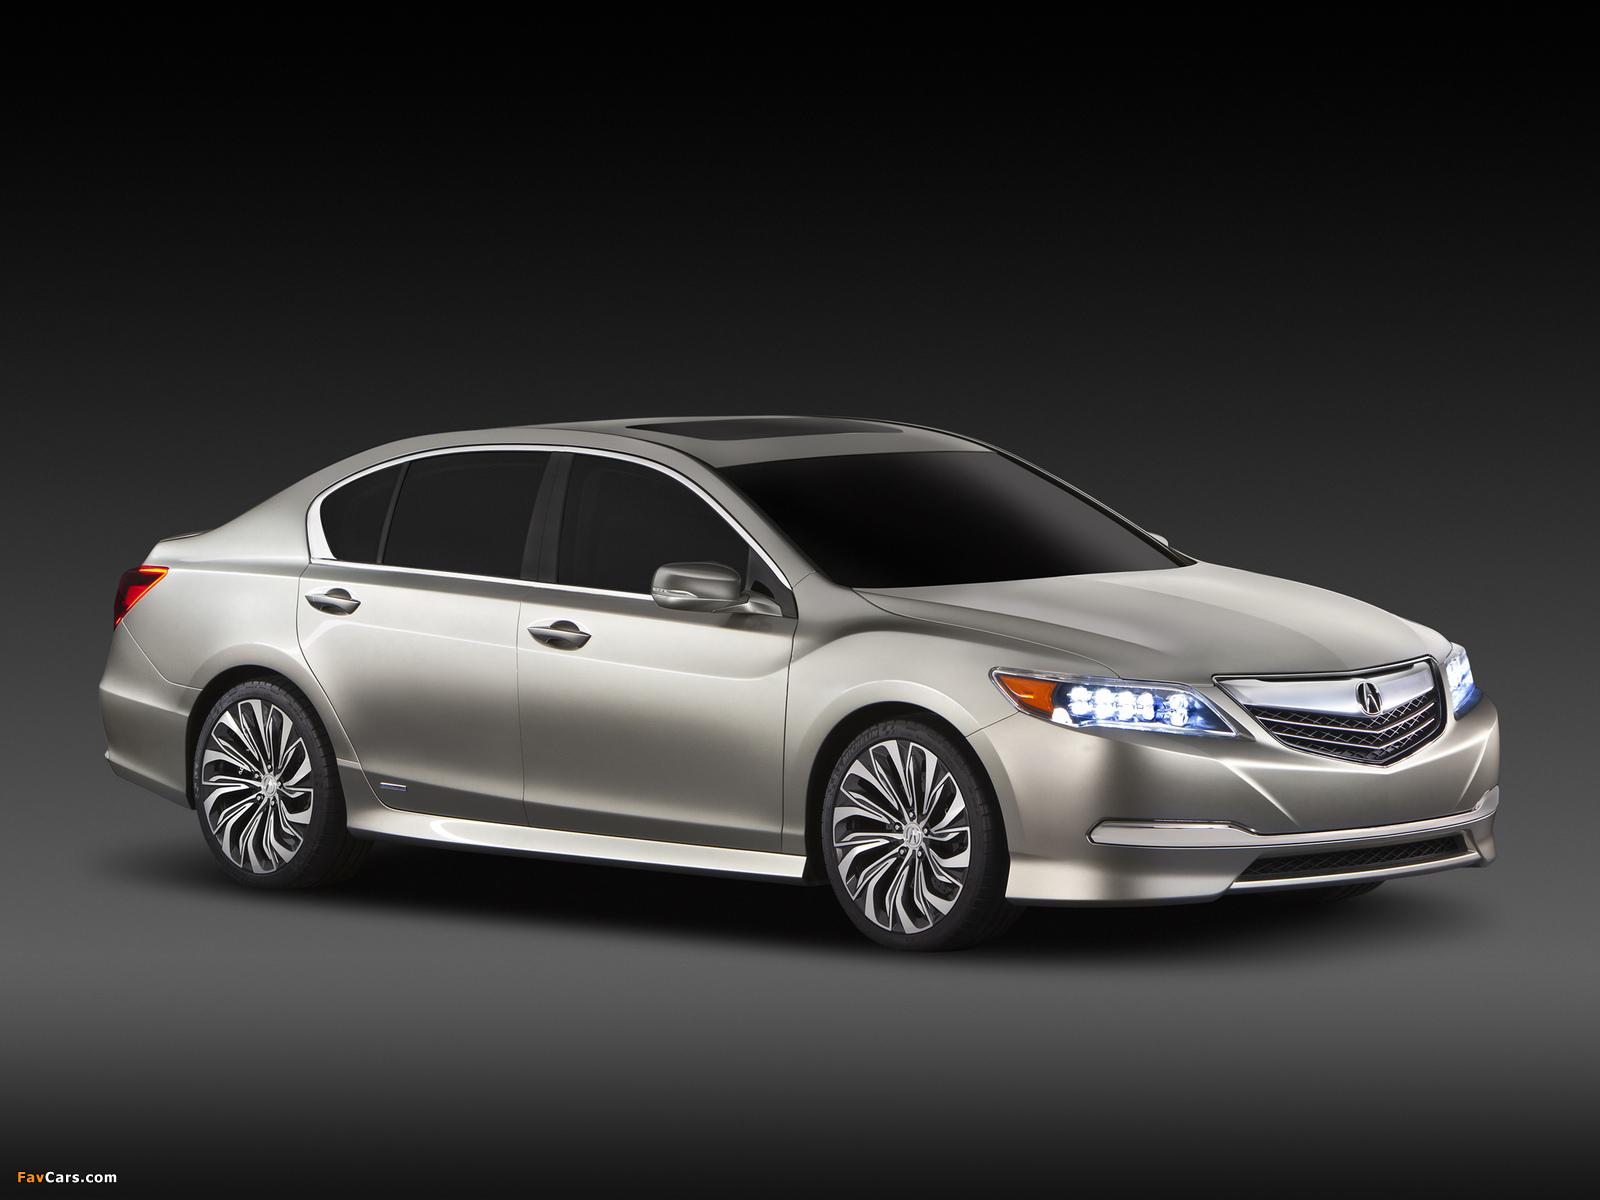 Acura RLX Concept (2012) images (1600 x 1200)